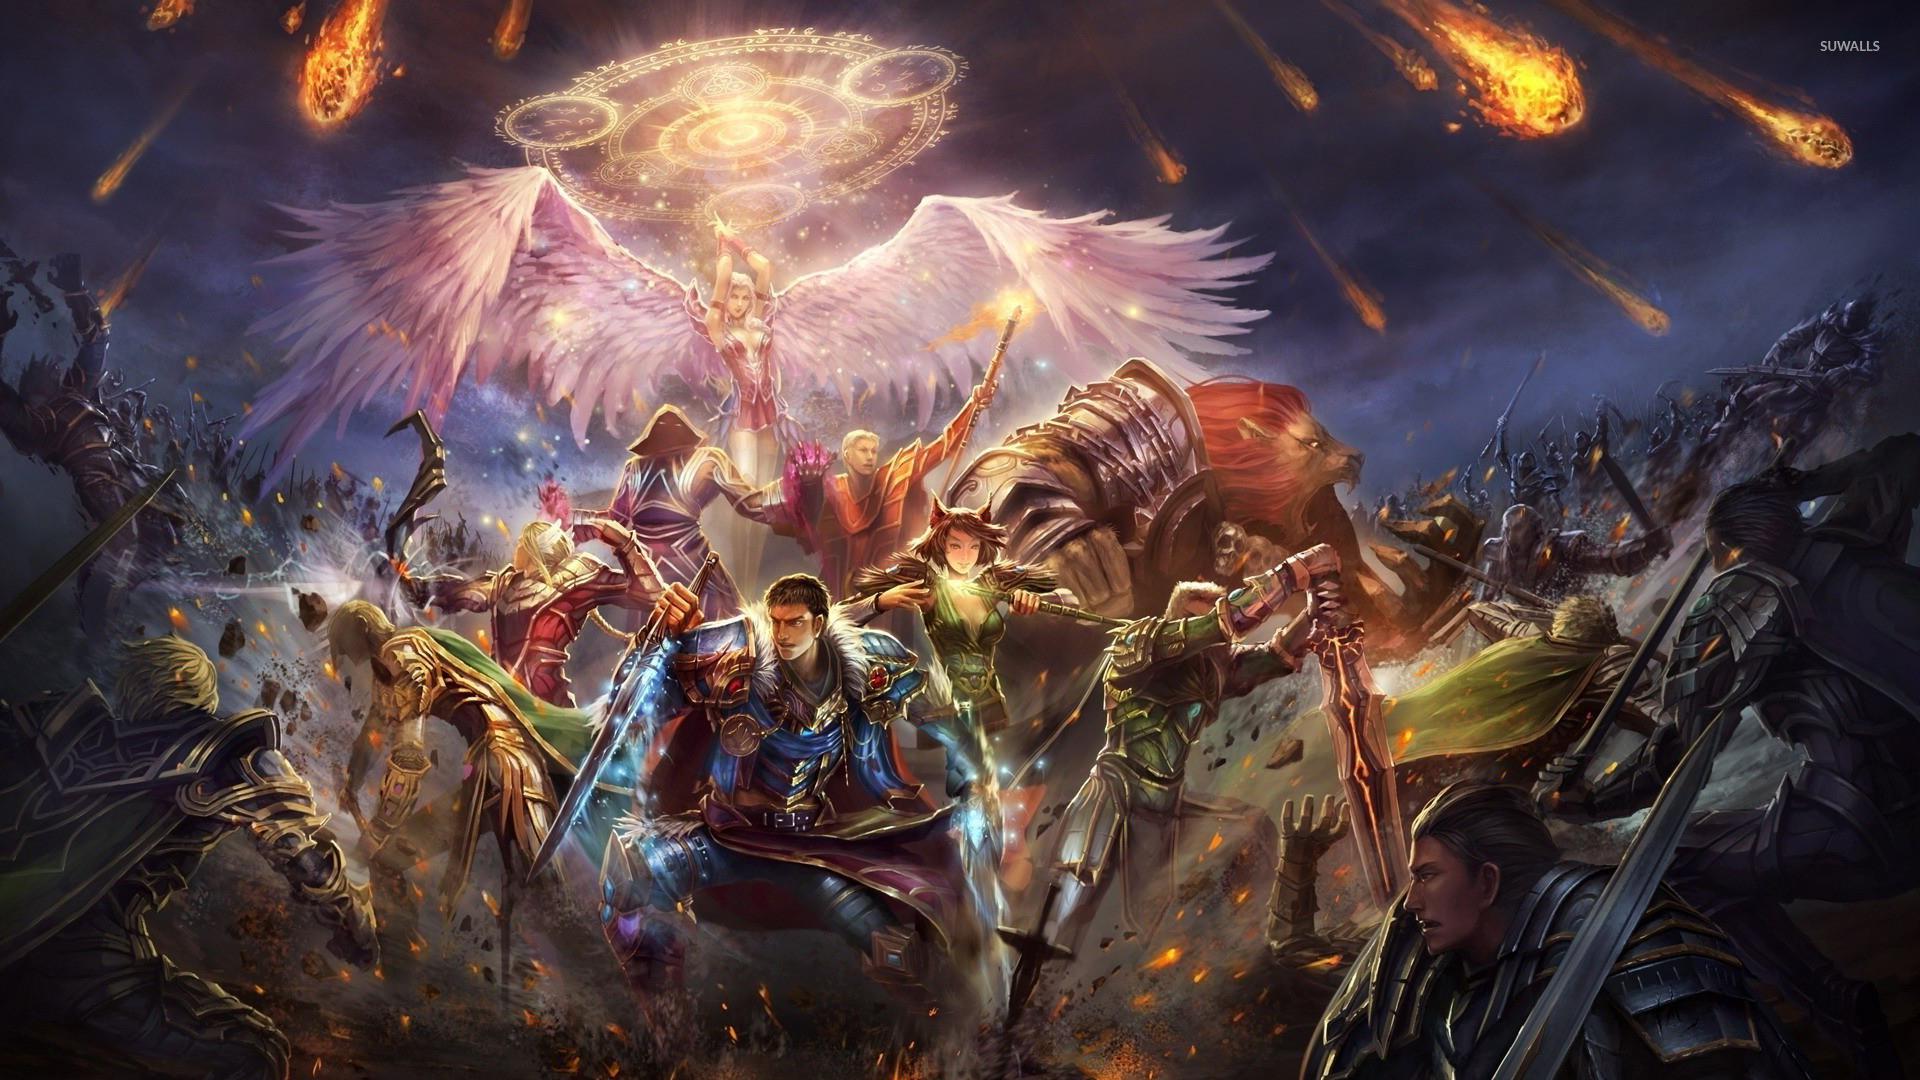 Epic battle wallpaper – Fantasy wallpapers – #17113